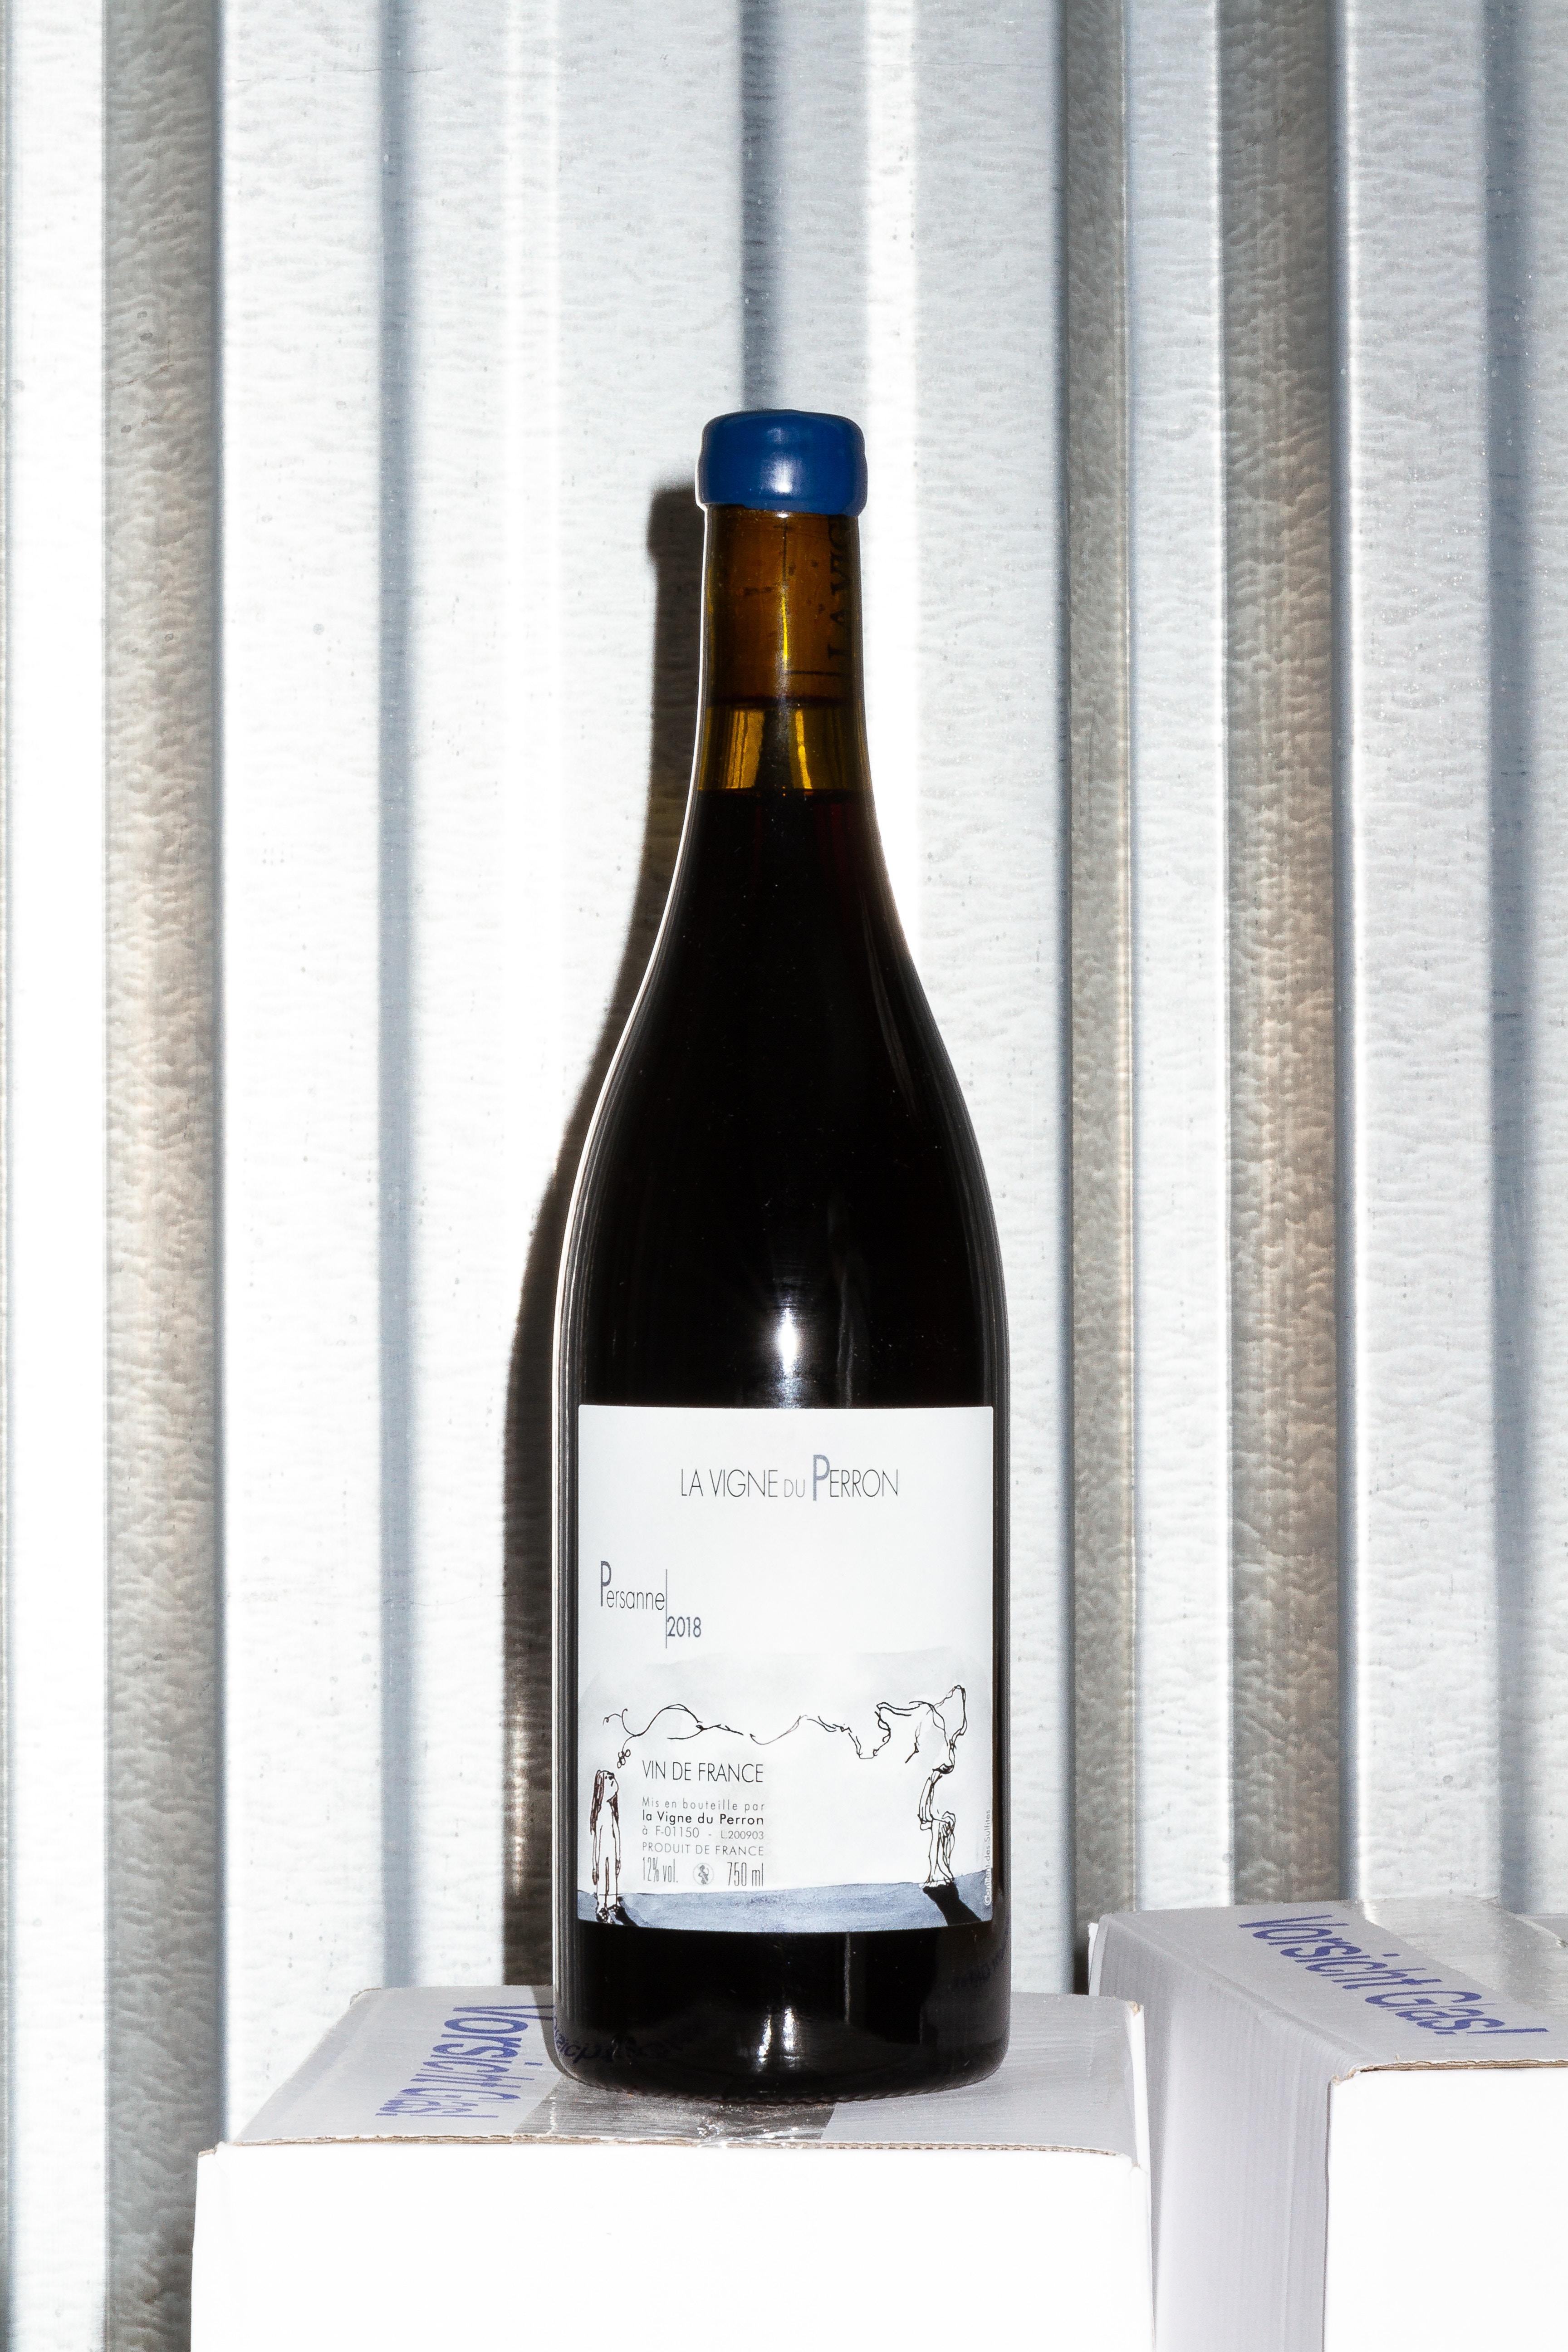 Persanne 2018 by La Vigne du Perron